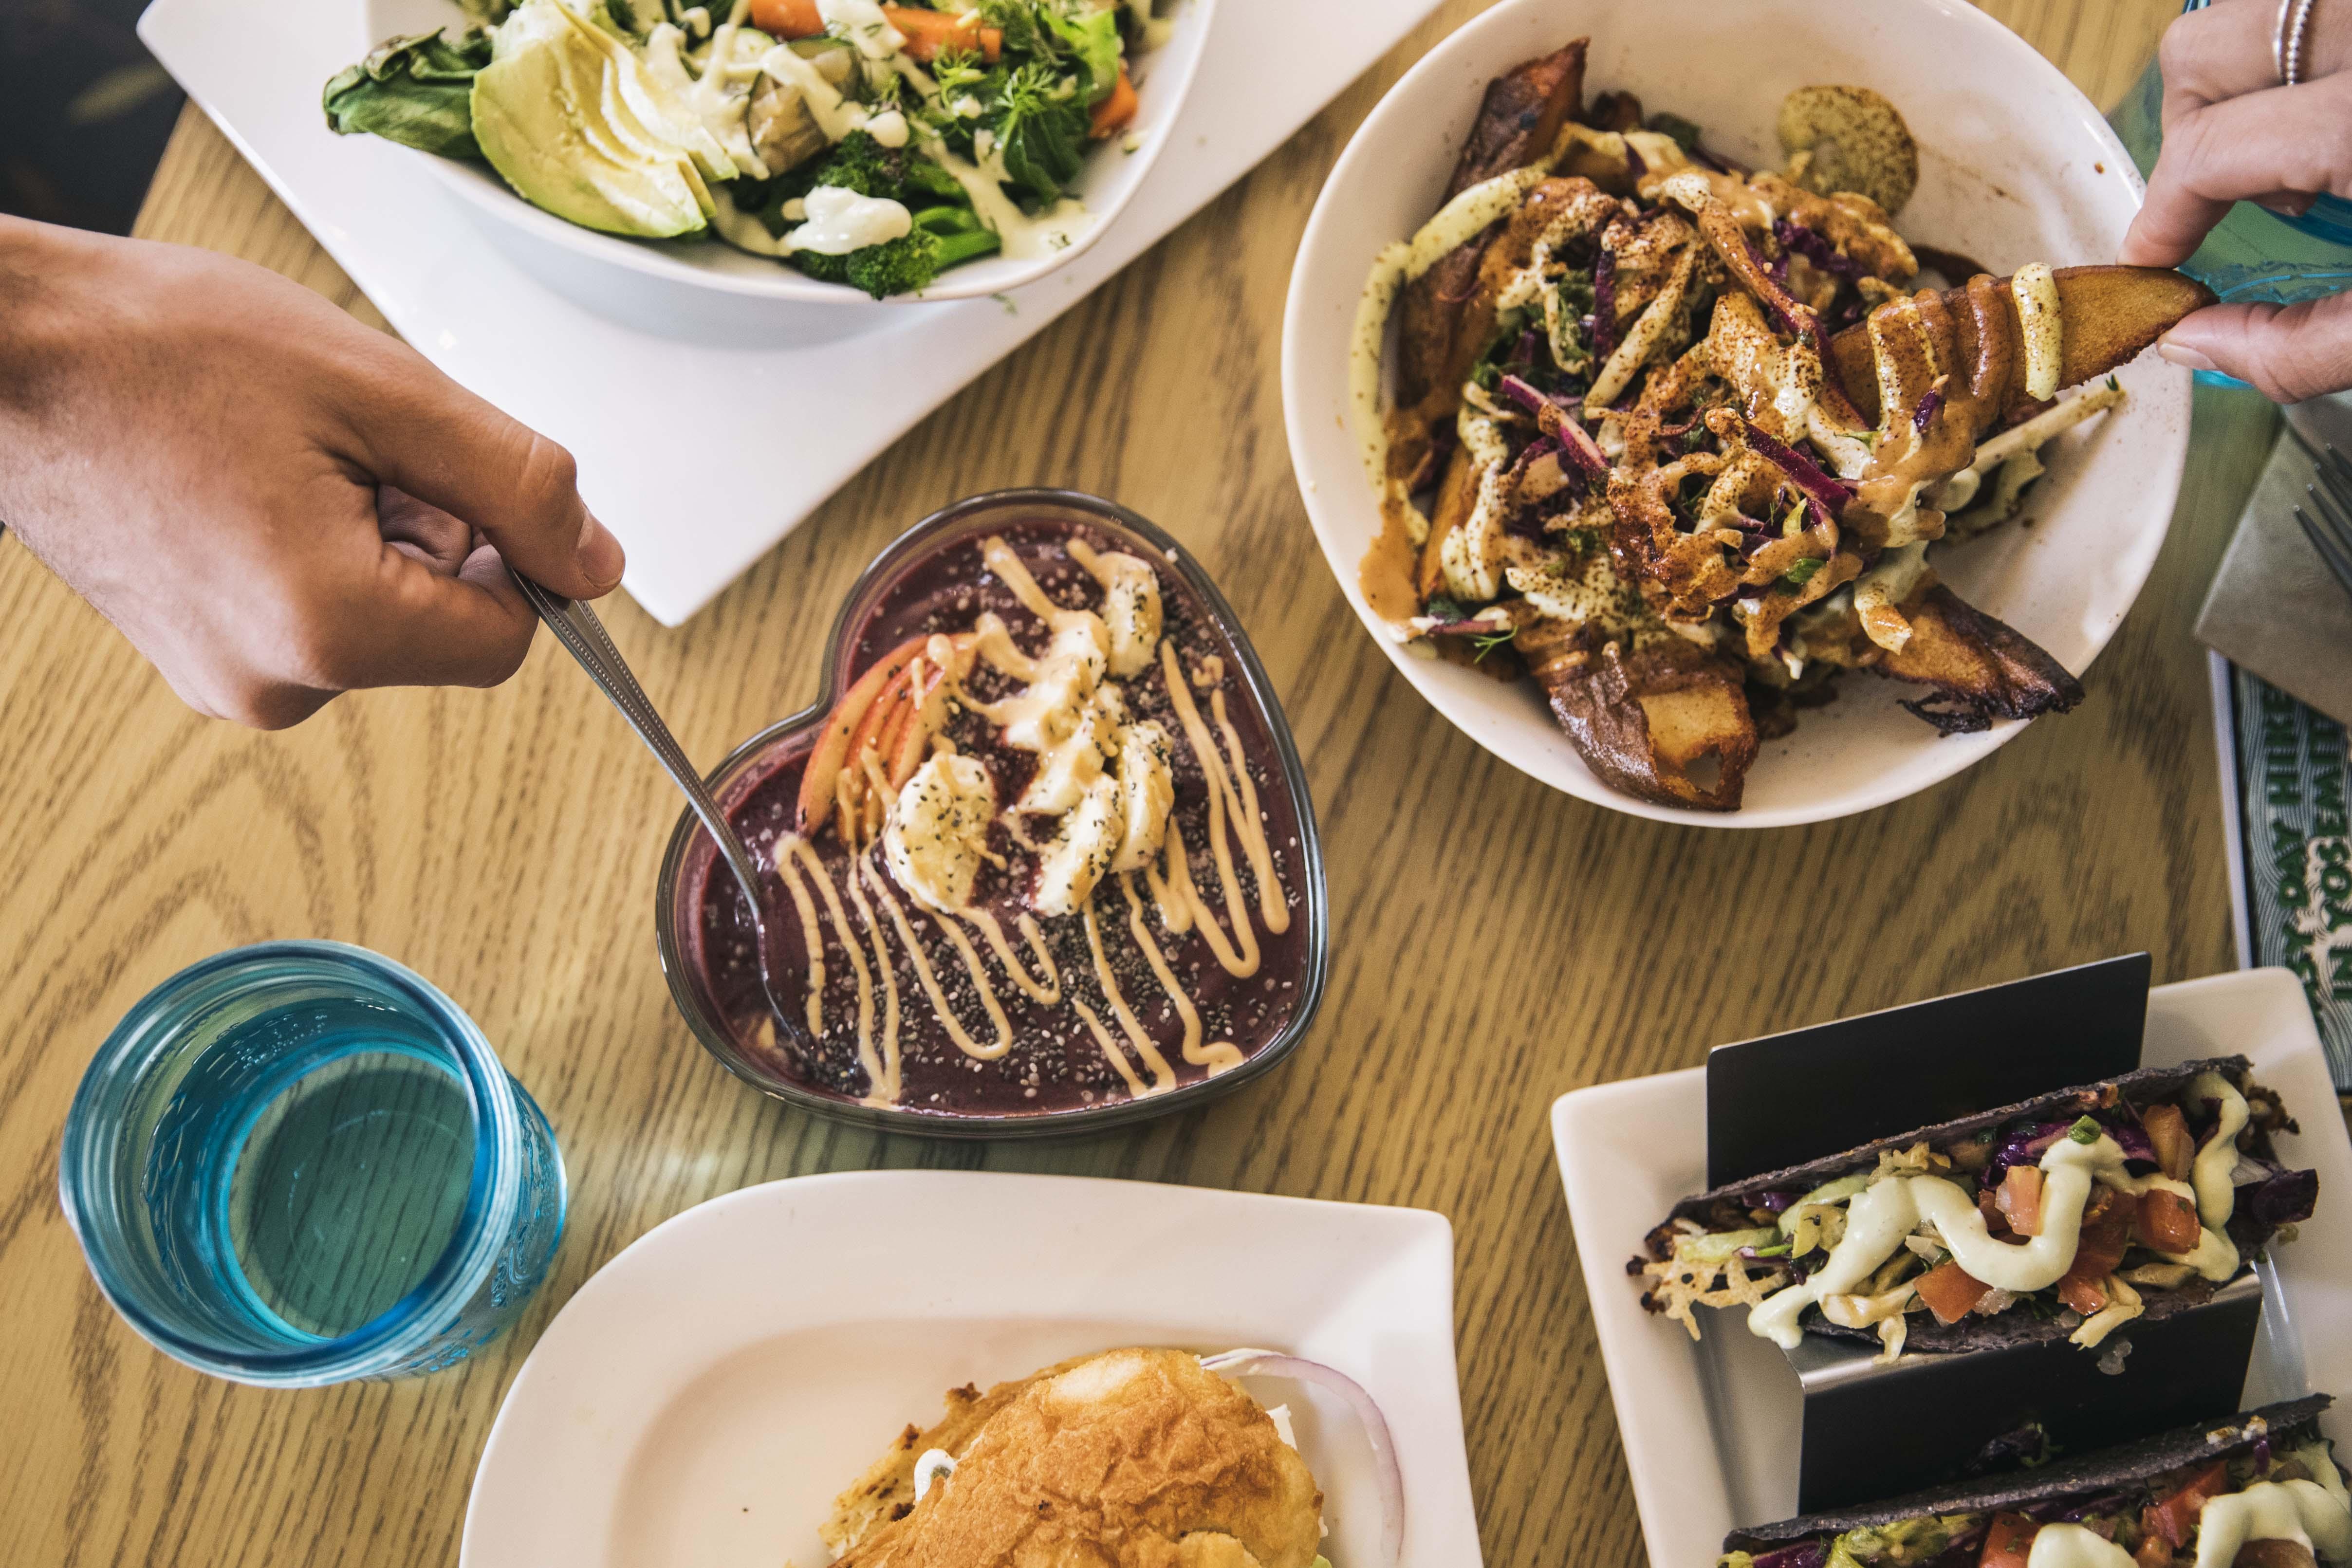 Love Cafe Vegan Food